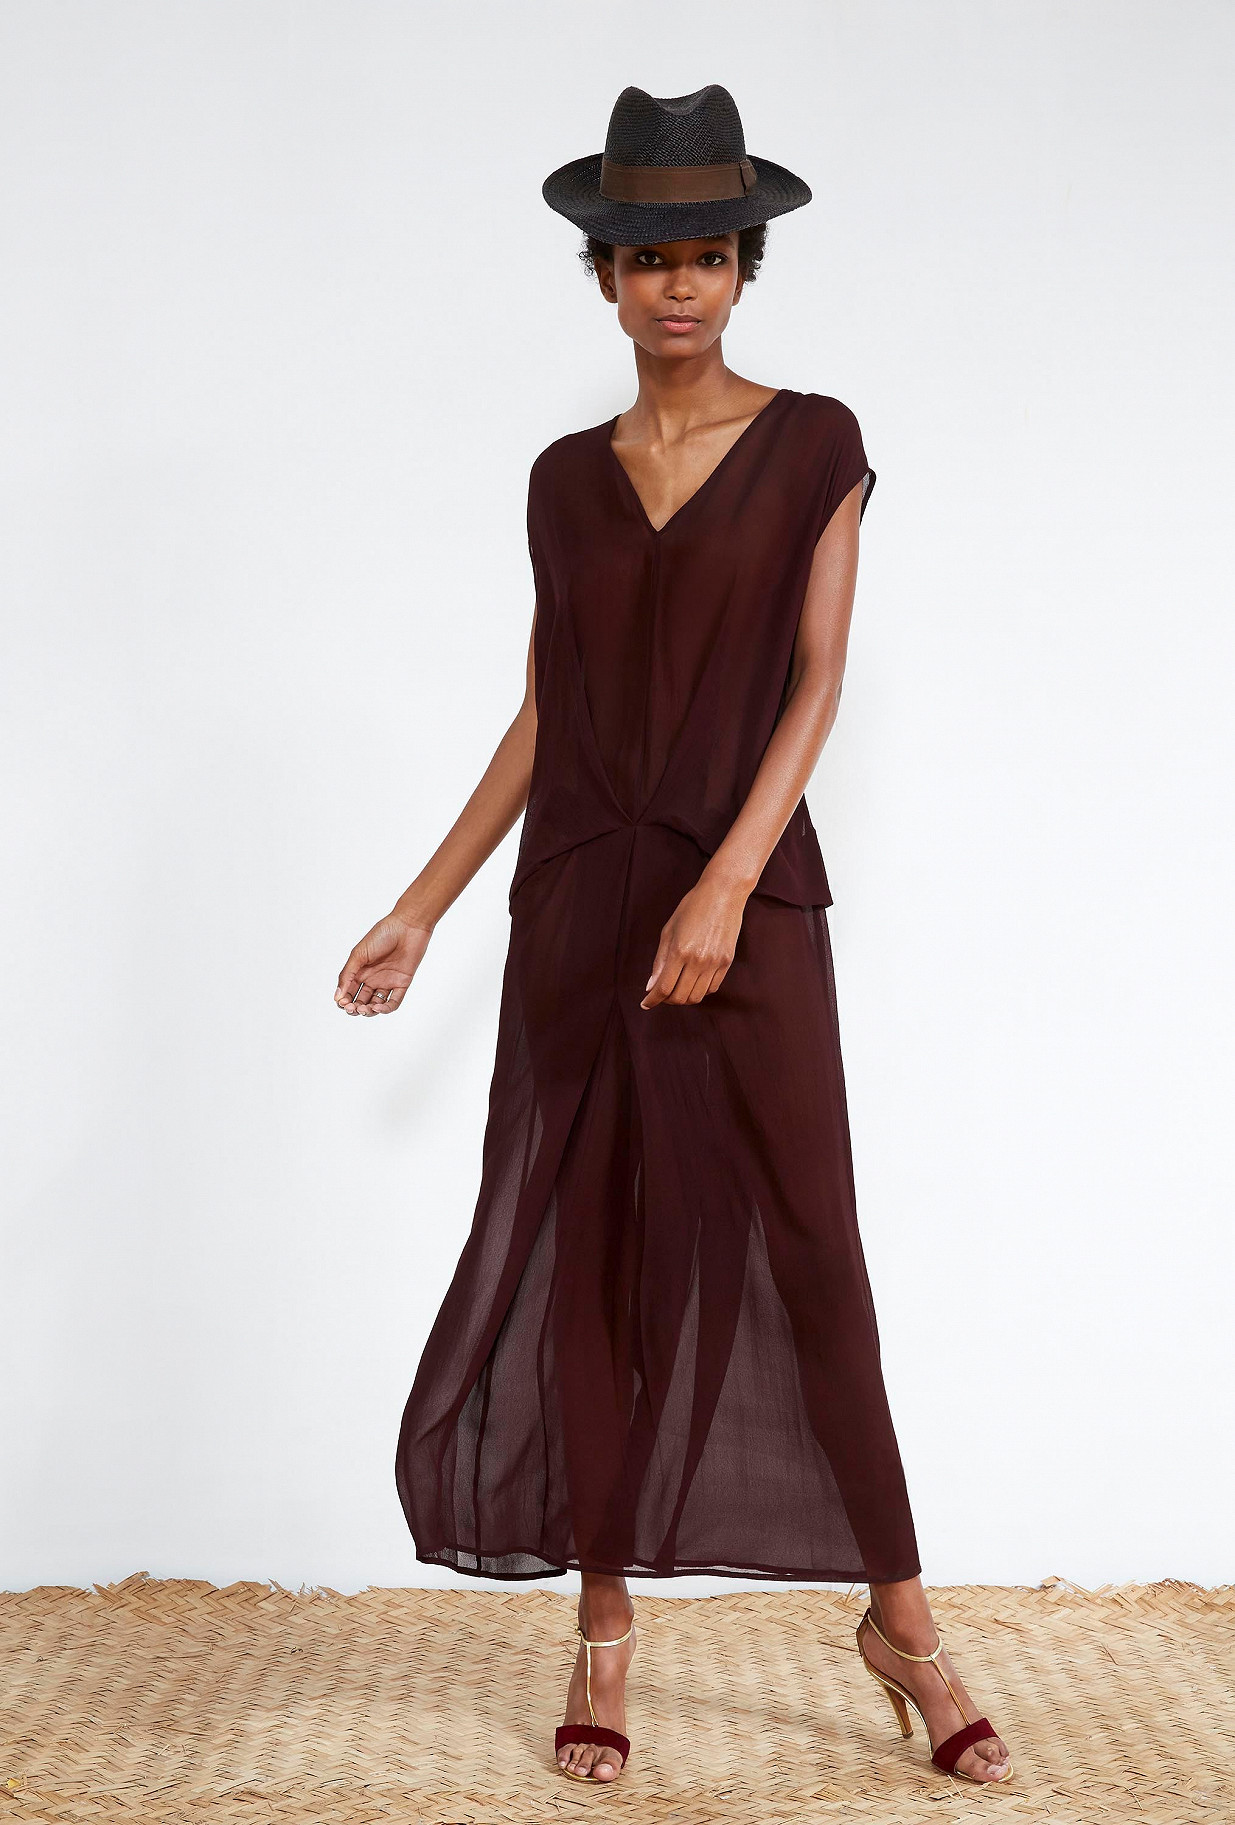 clothes store DRESS  Buto french designer fashion Paris